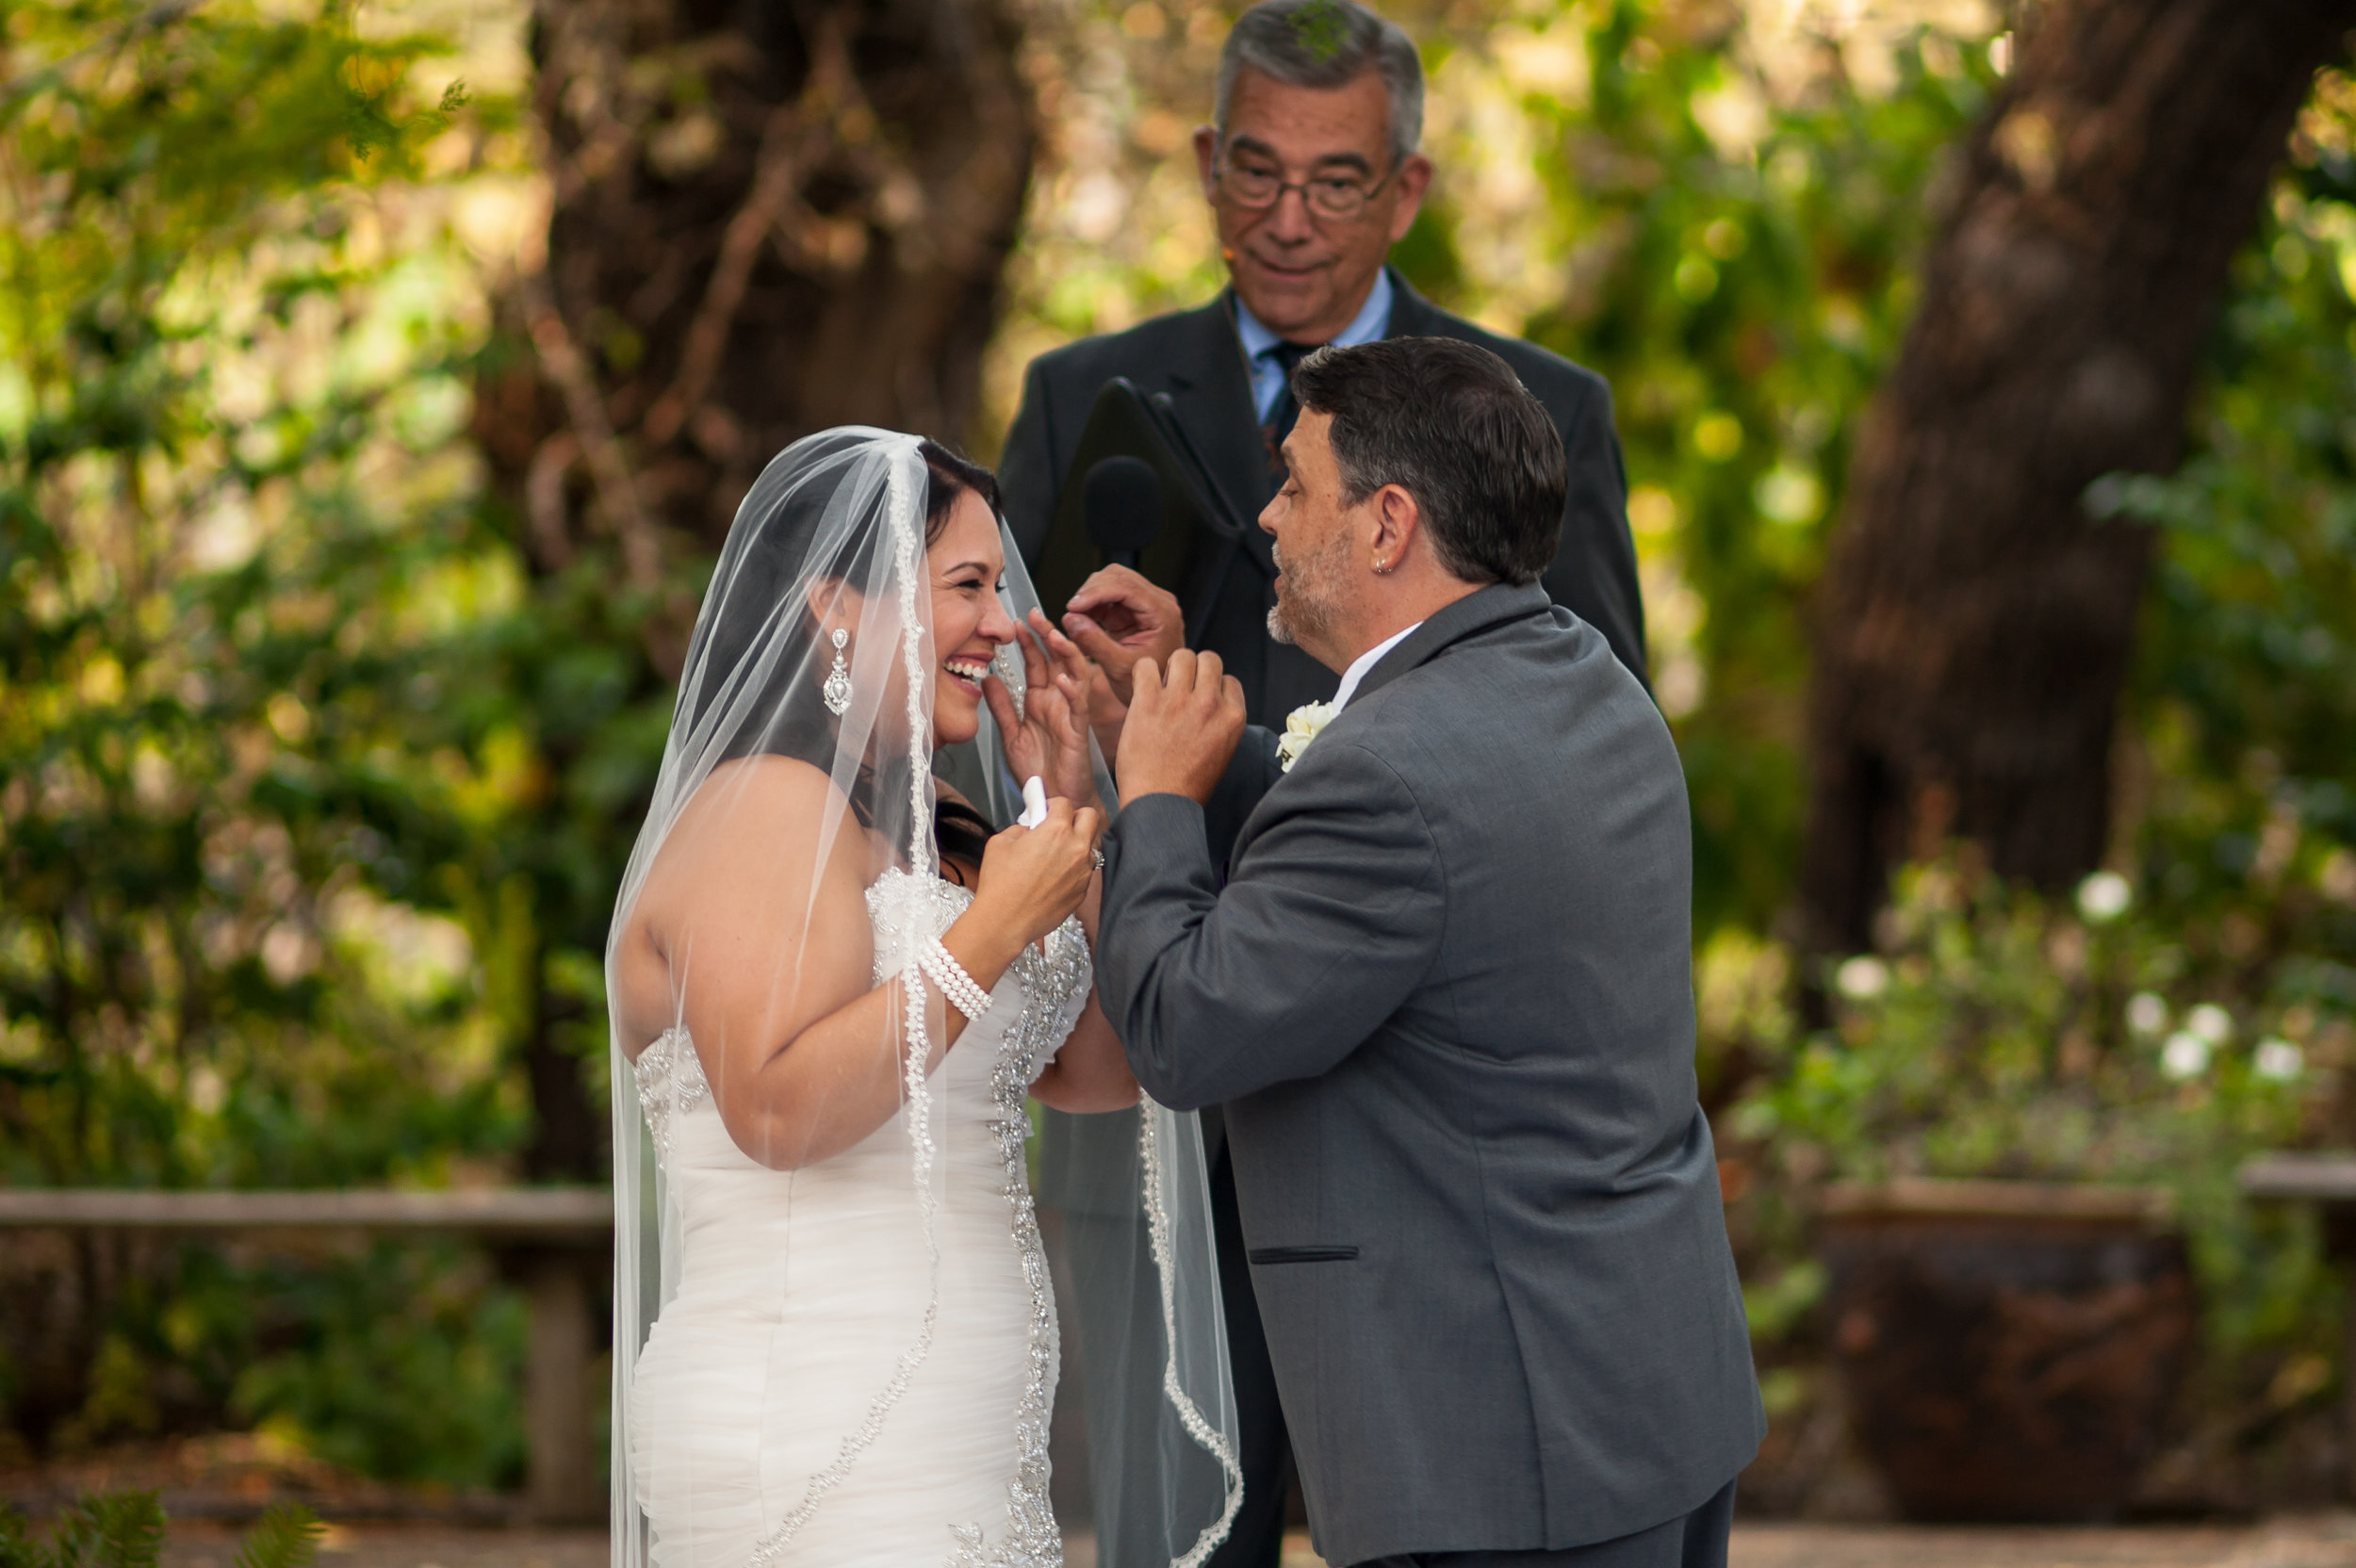 erika-seth-024-monte-verde-inn-sacramento-wedding-photographer-katherine-nicole-photography.JPG